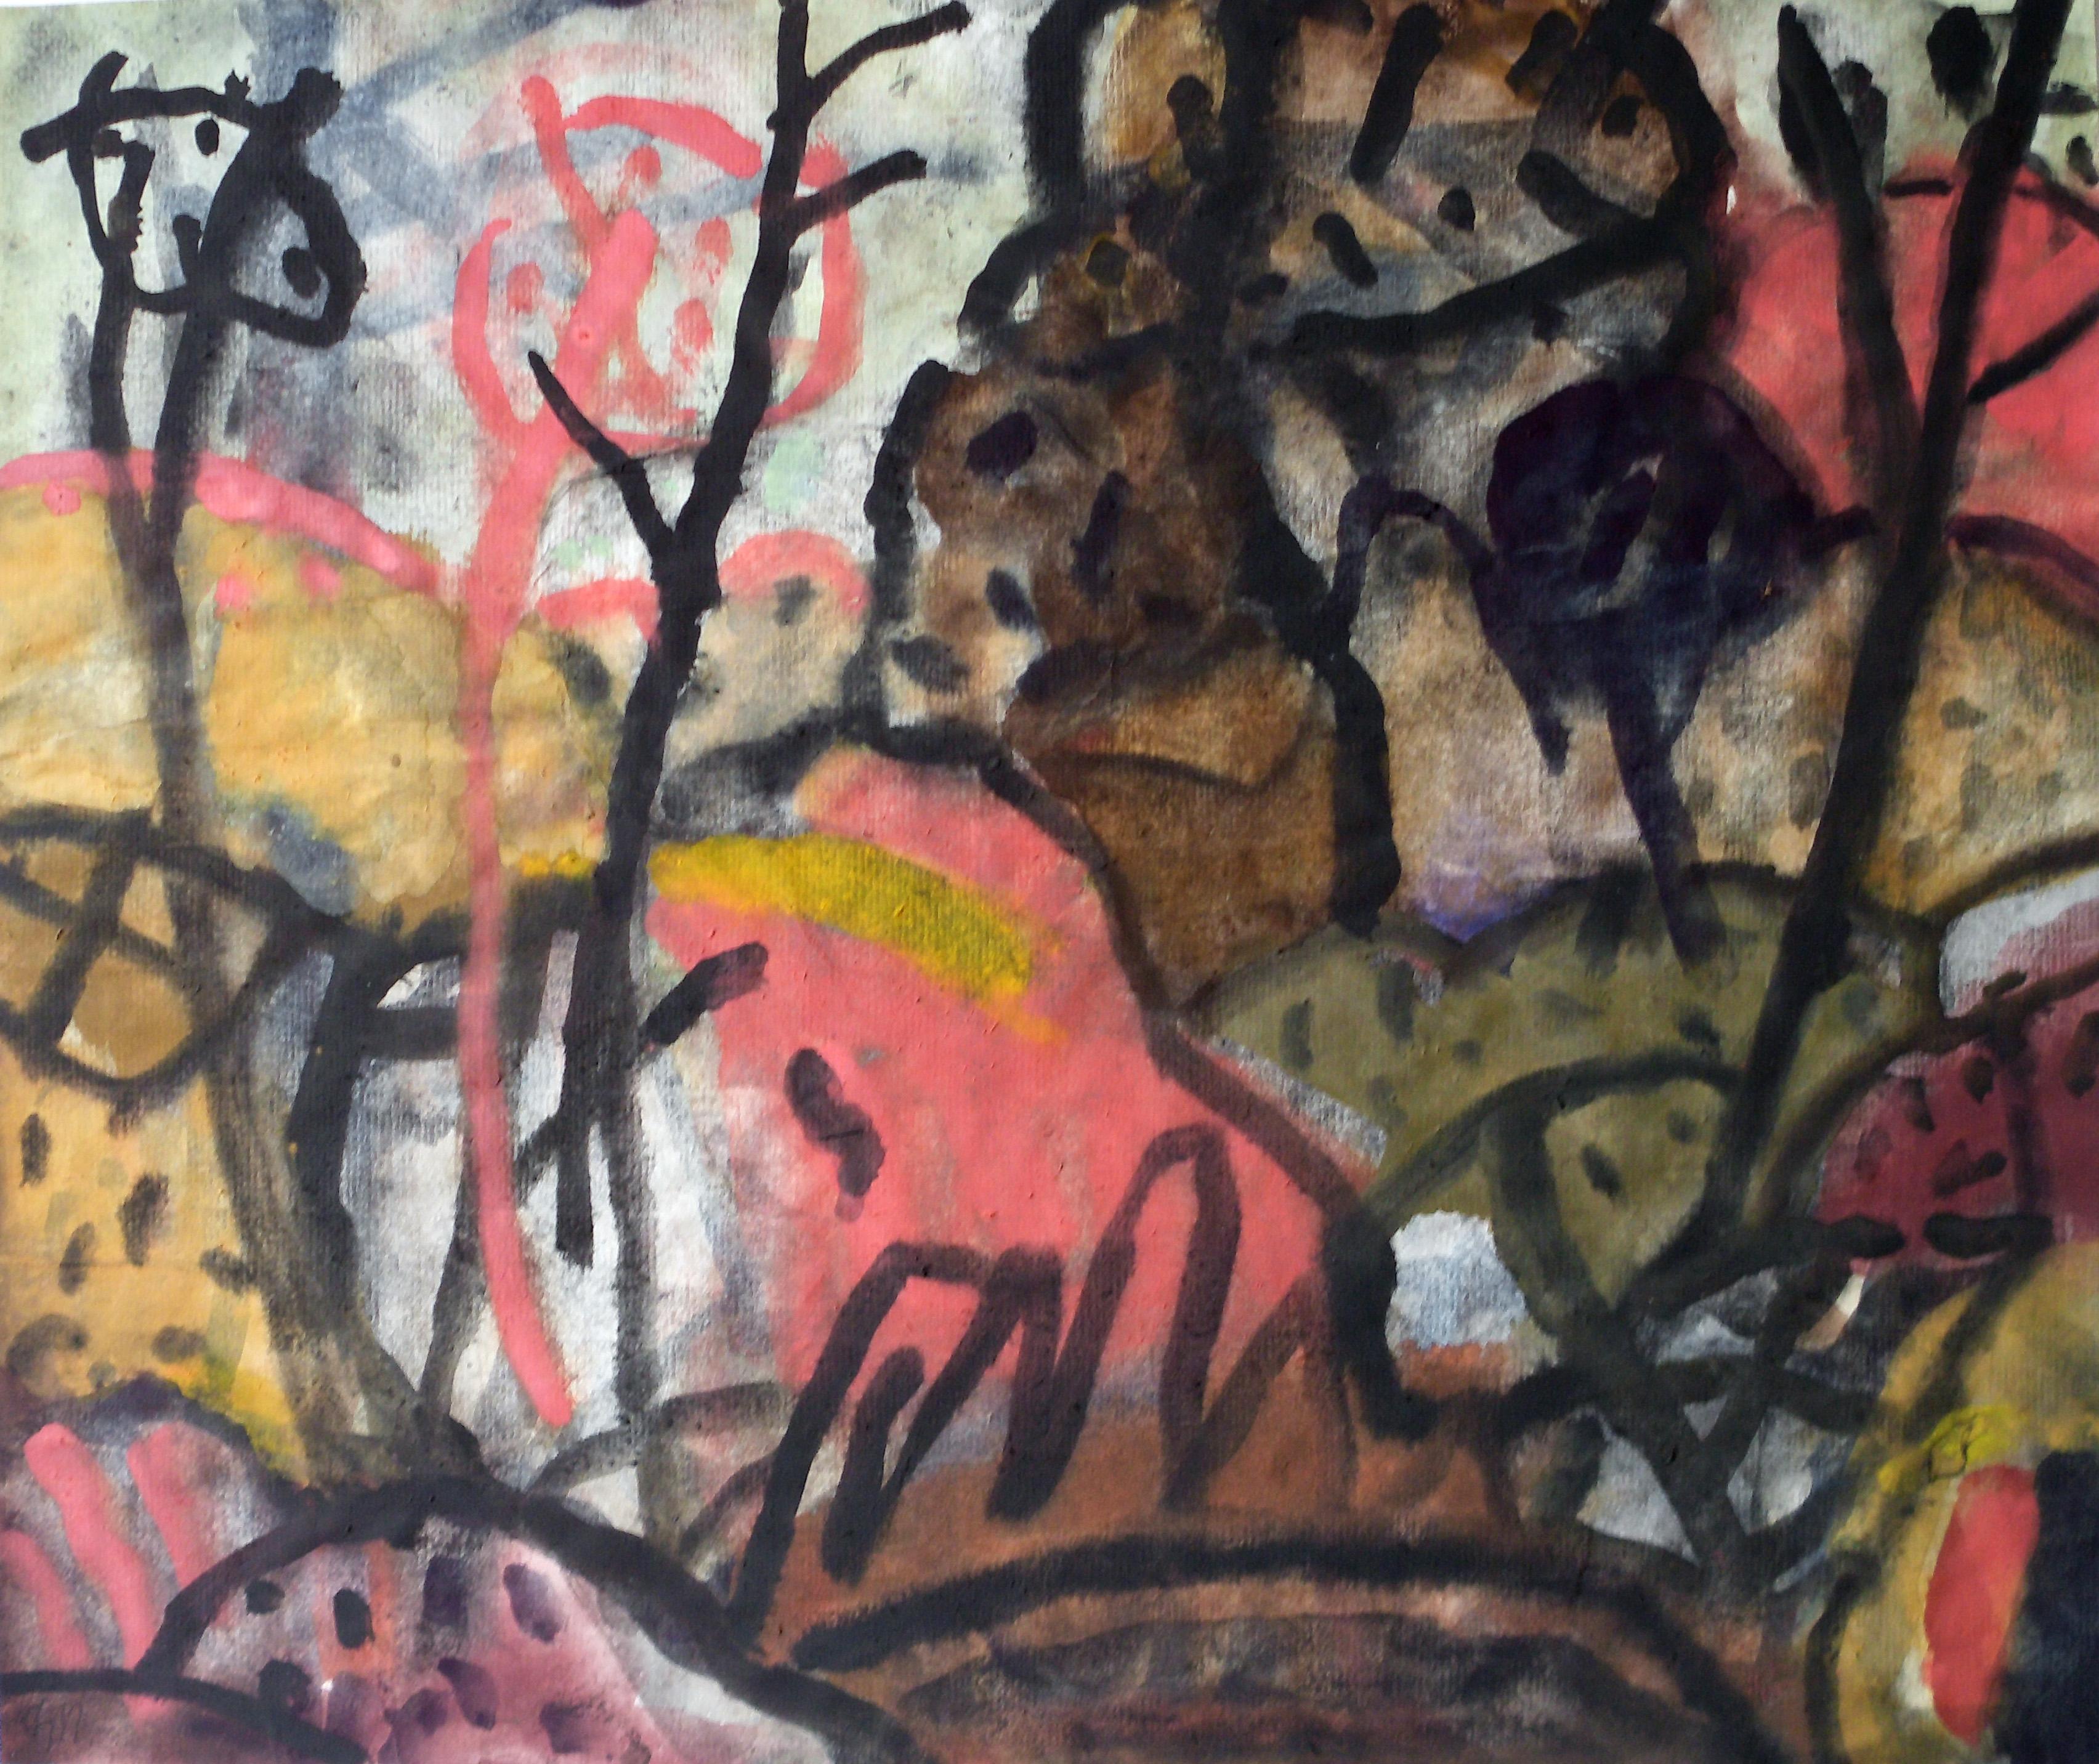 05-christian_hasse-waldlandschaft-2011-aquarell-42.5x50.5